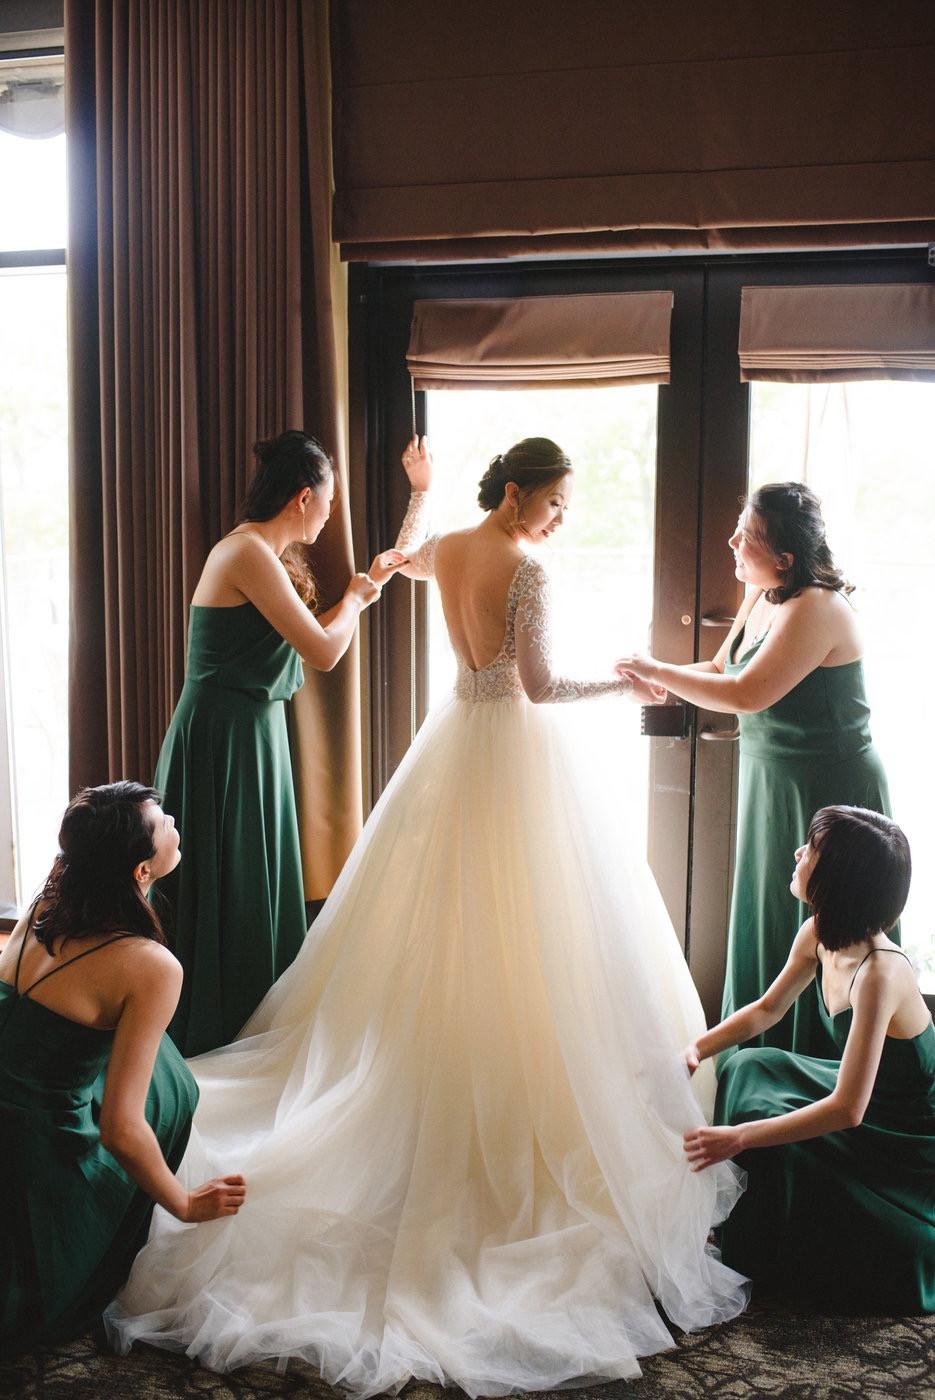 Change & Wei Wedding-Sense Events-多伦多婚礼策-Bridal party 4